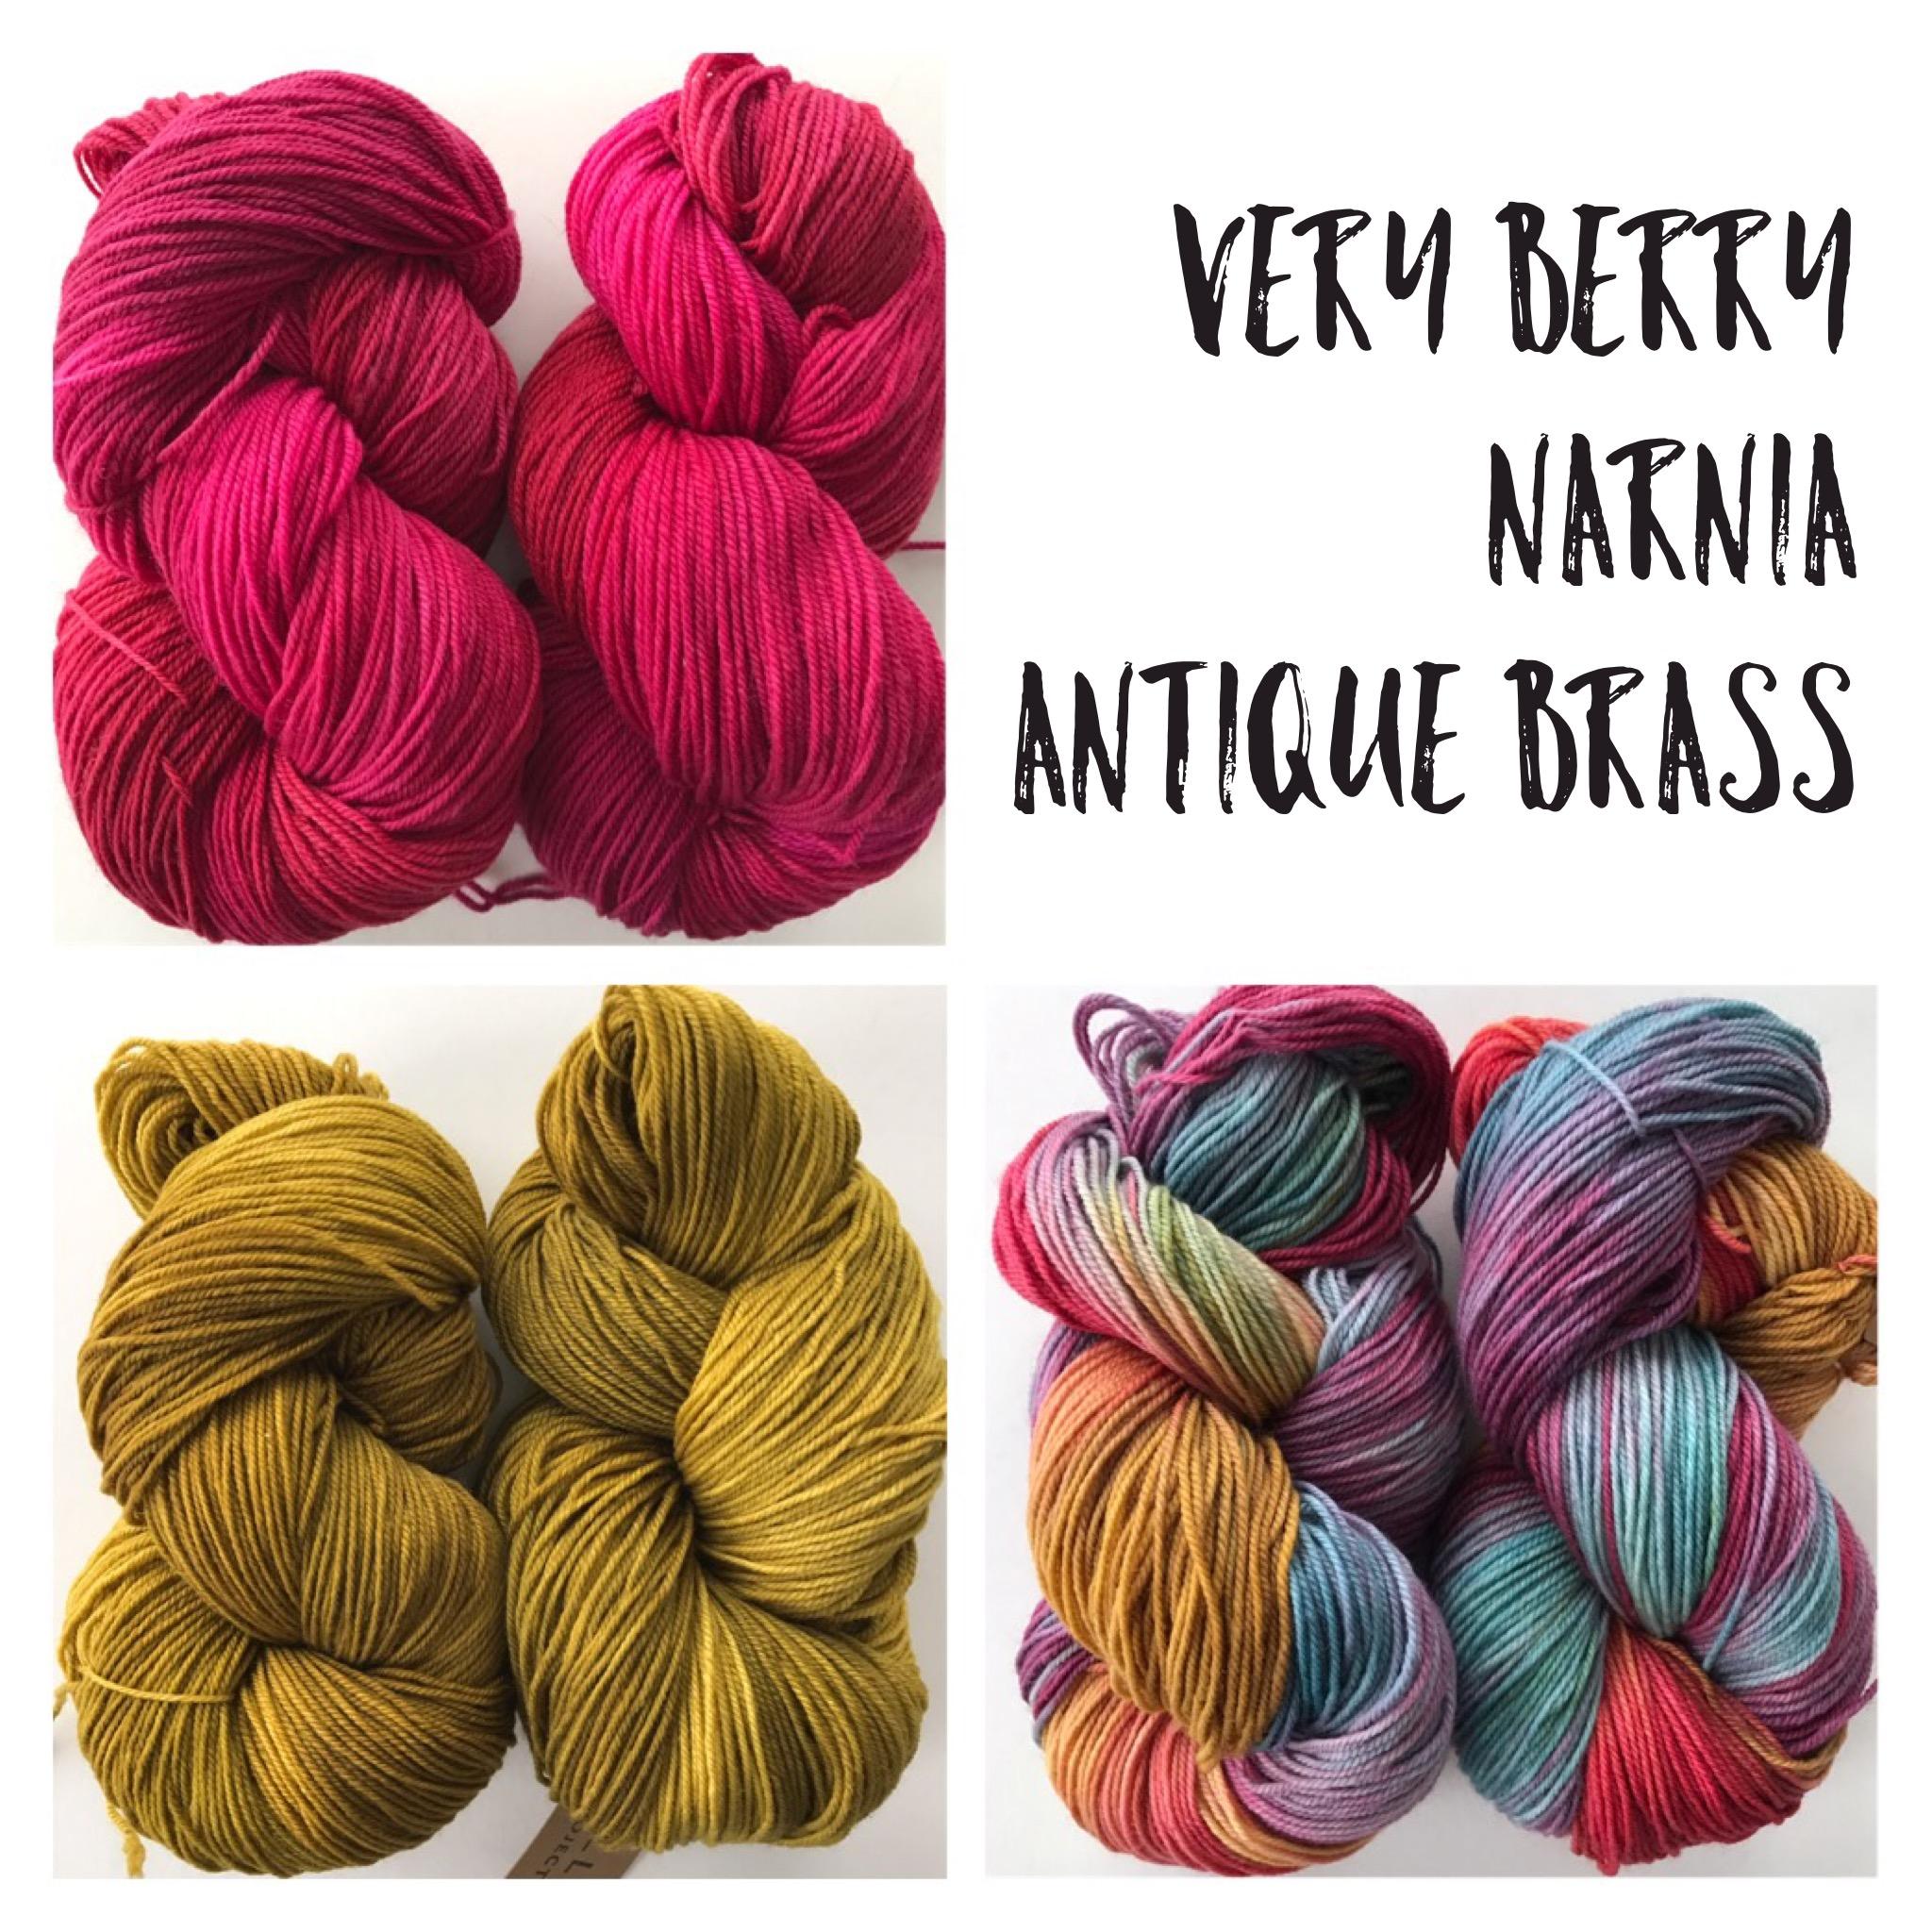 Simply Socks Yarn Co. Blog: